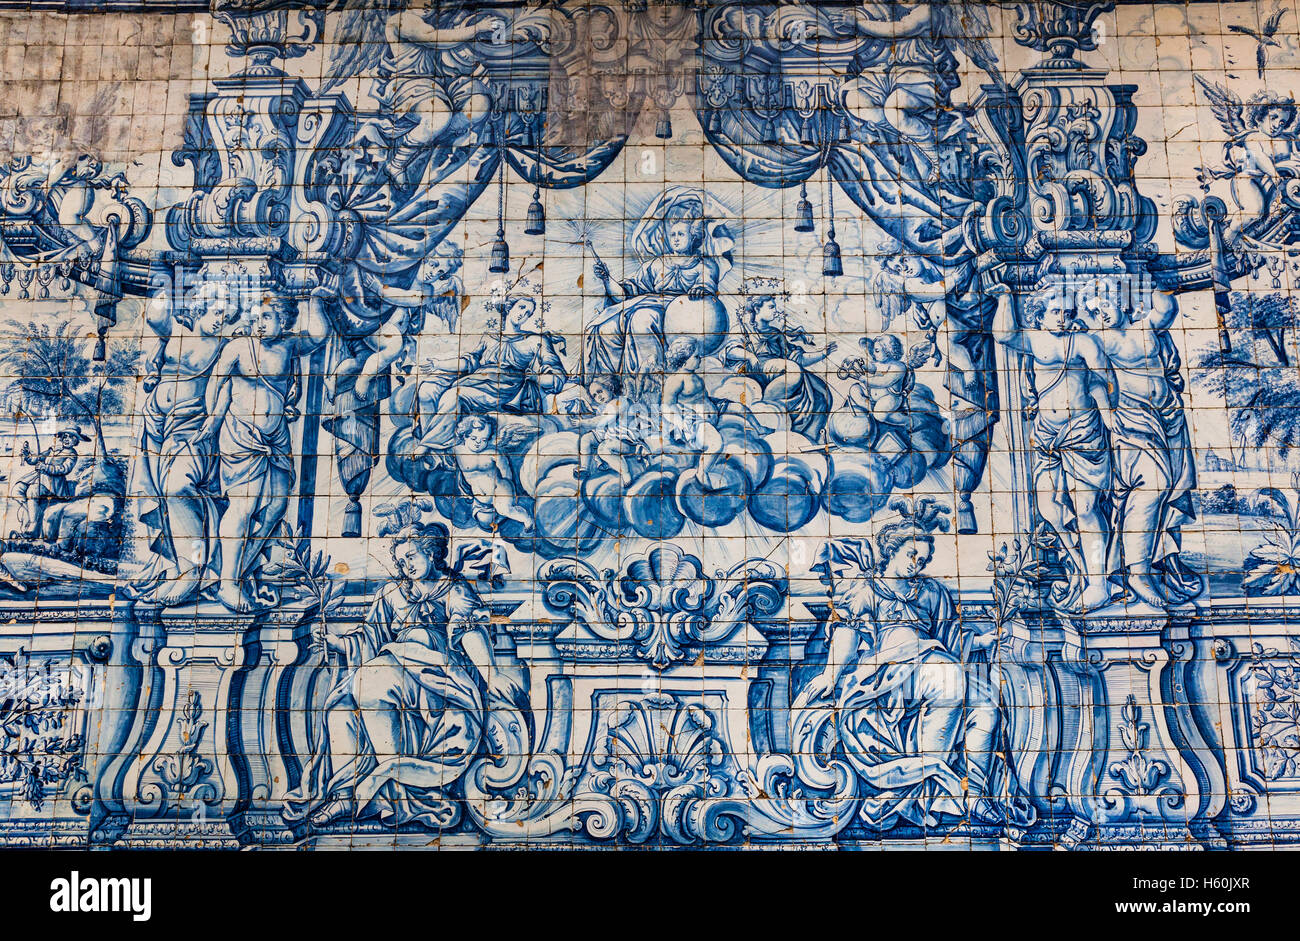 Portugal, Region Norte, Porto, barouqe azulejos at the gothic cloister of Porto Cathedral, Se do Porto Stock Photo